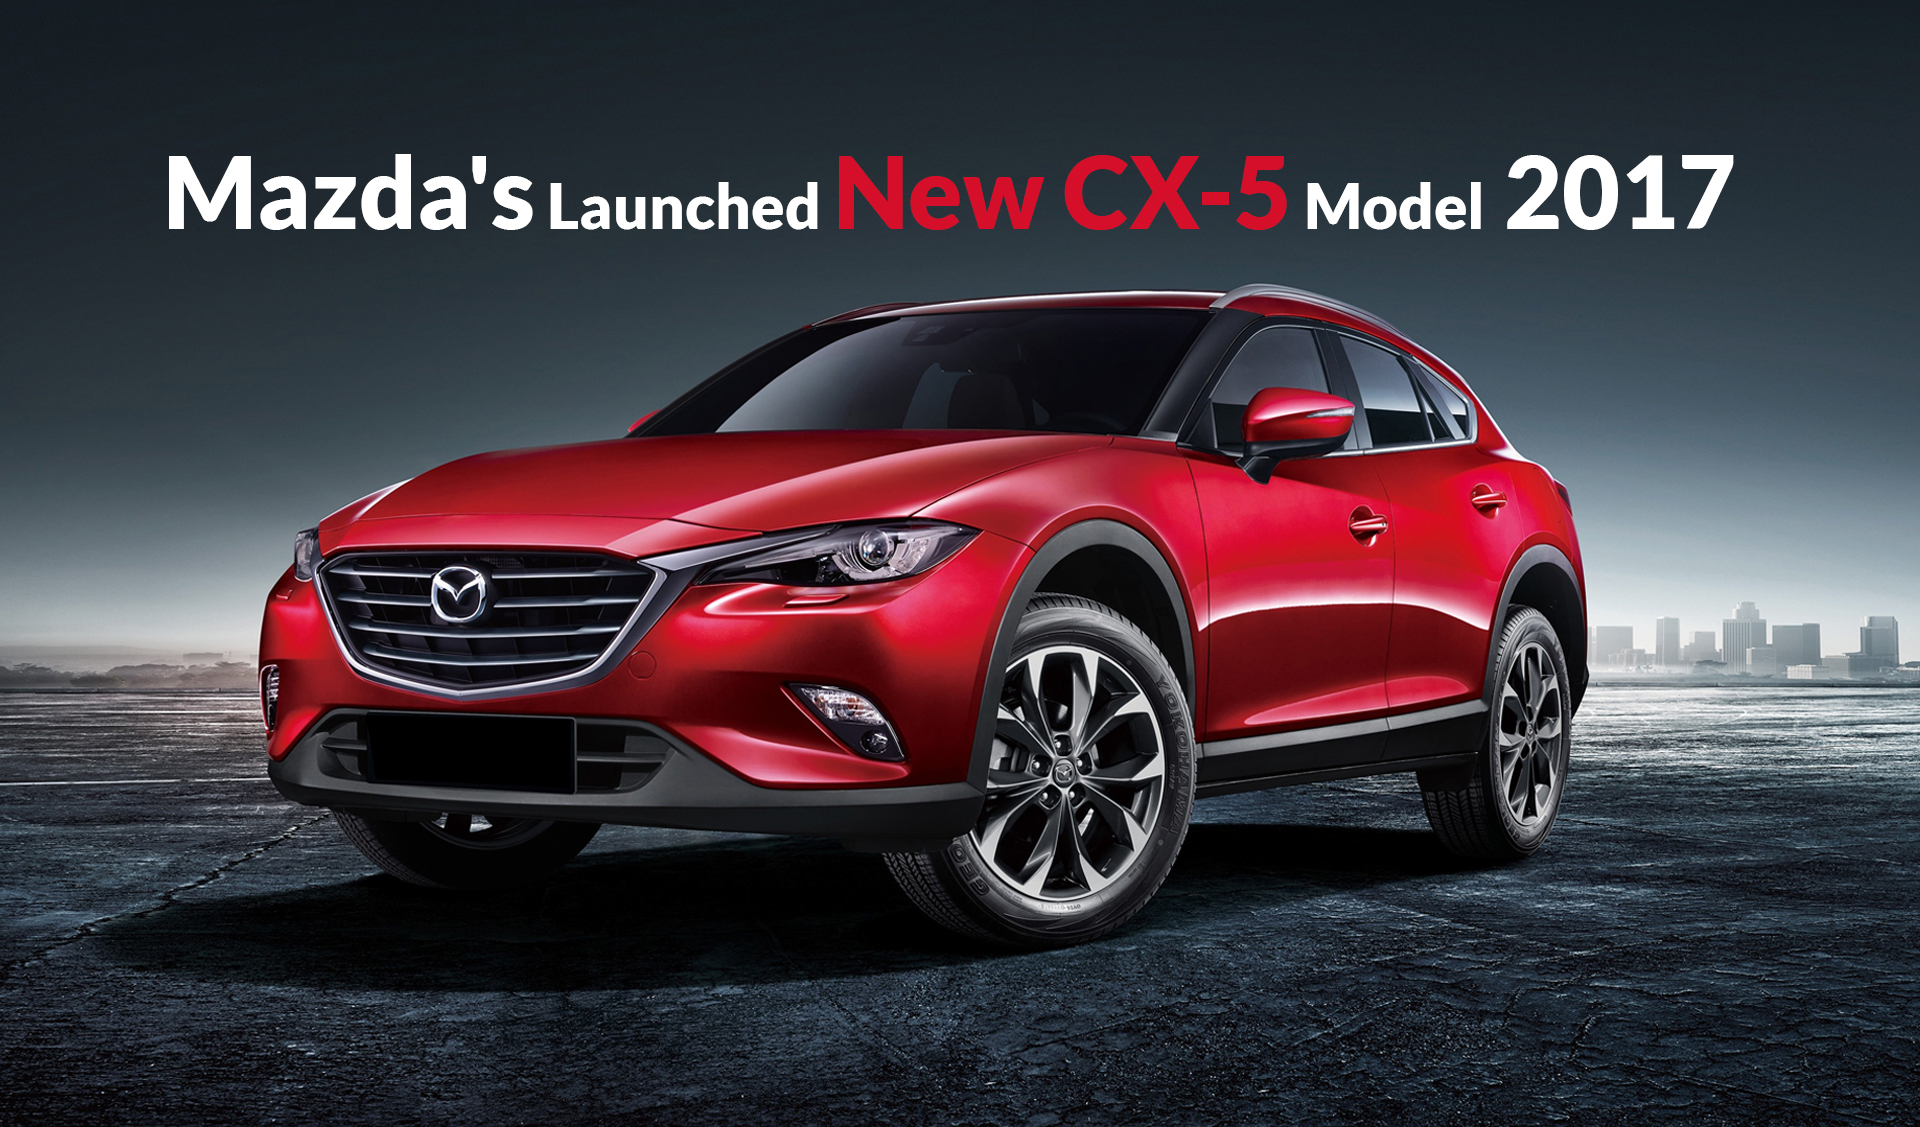 Mazda S Launched New Cx 5 Model 2017 Ebuddynews